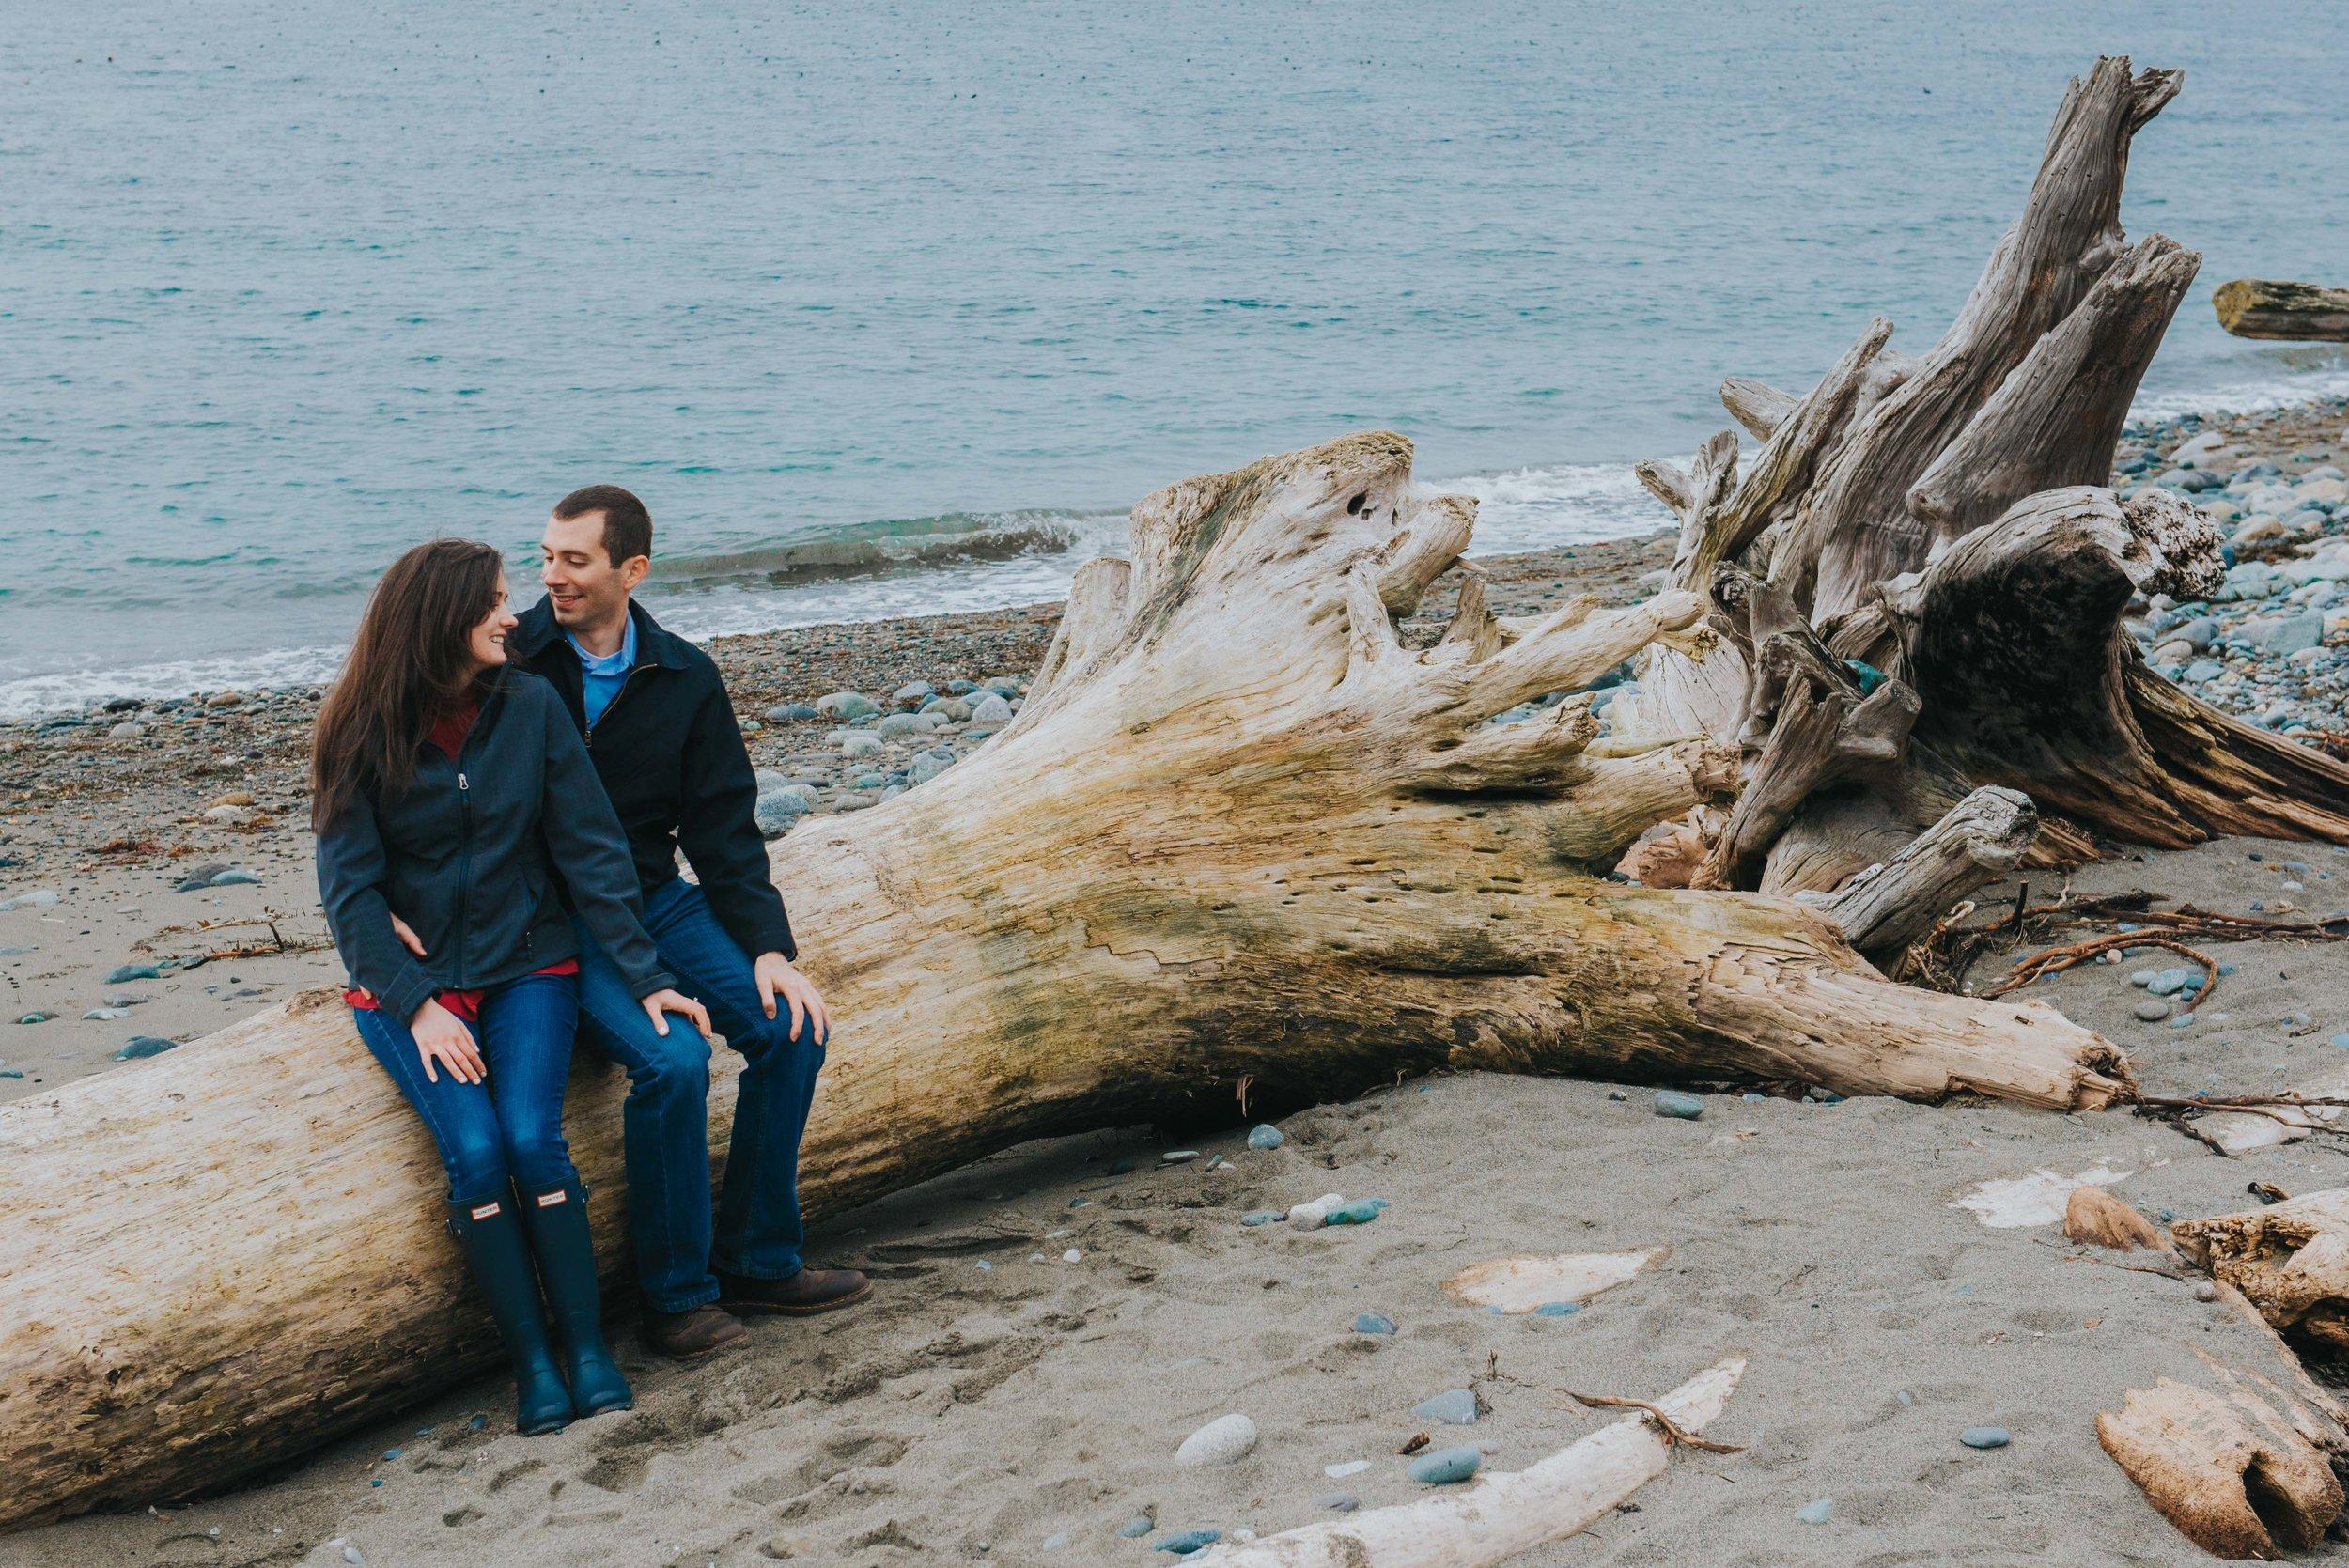 Oak-Harbor-Wedding-Photographer-J-Hodges (24 of 34).jpg